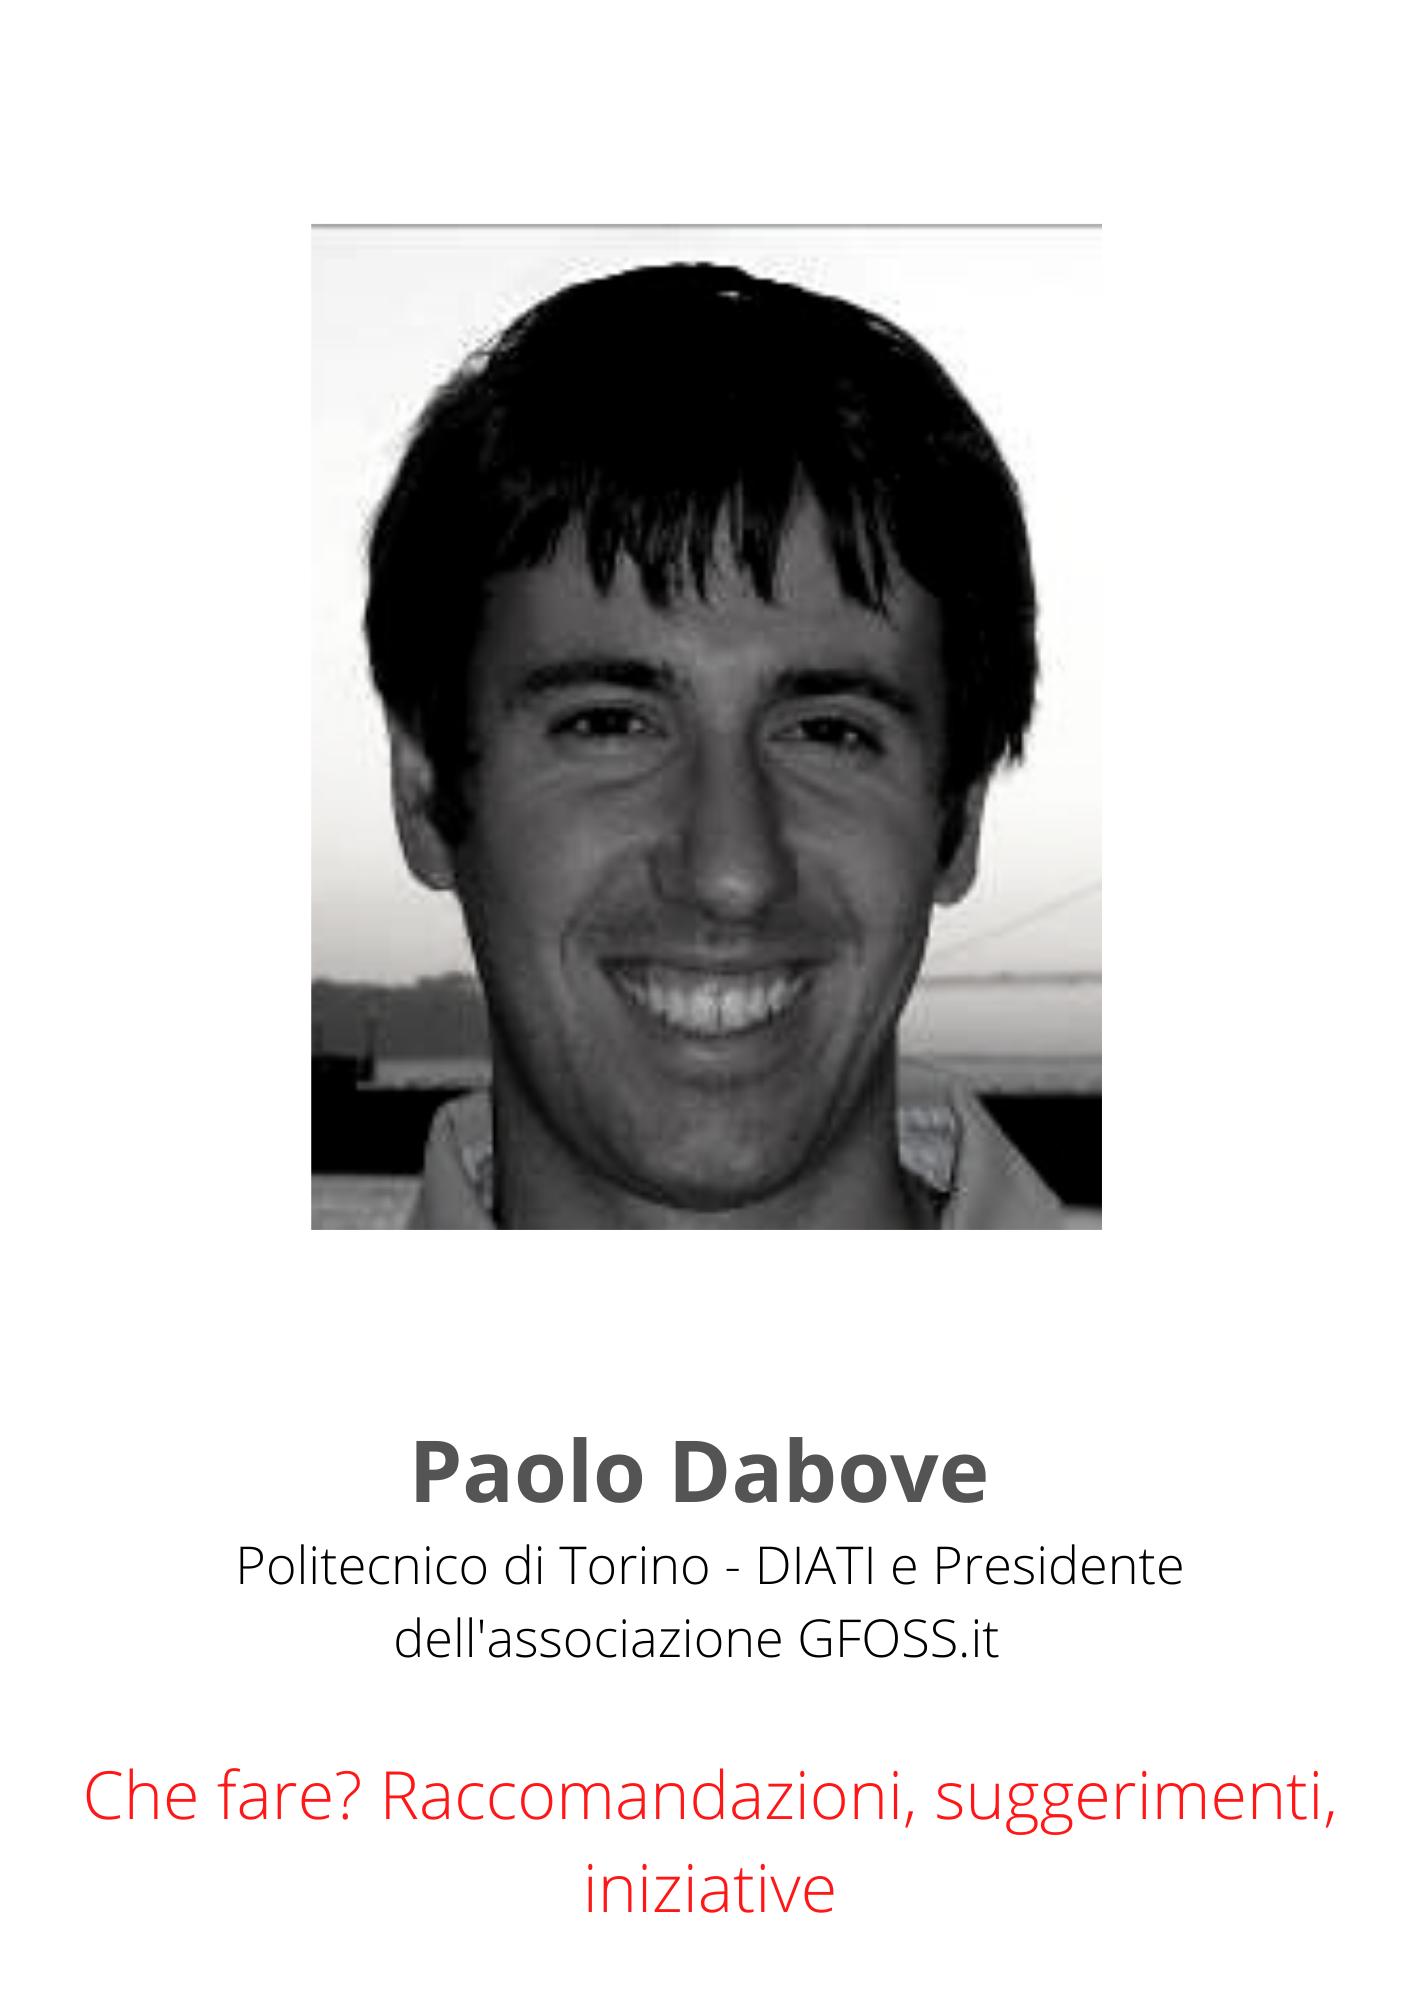 Paolo Dabove